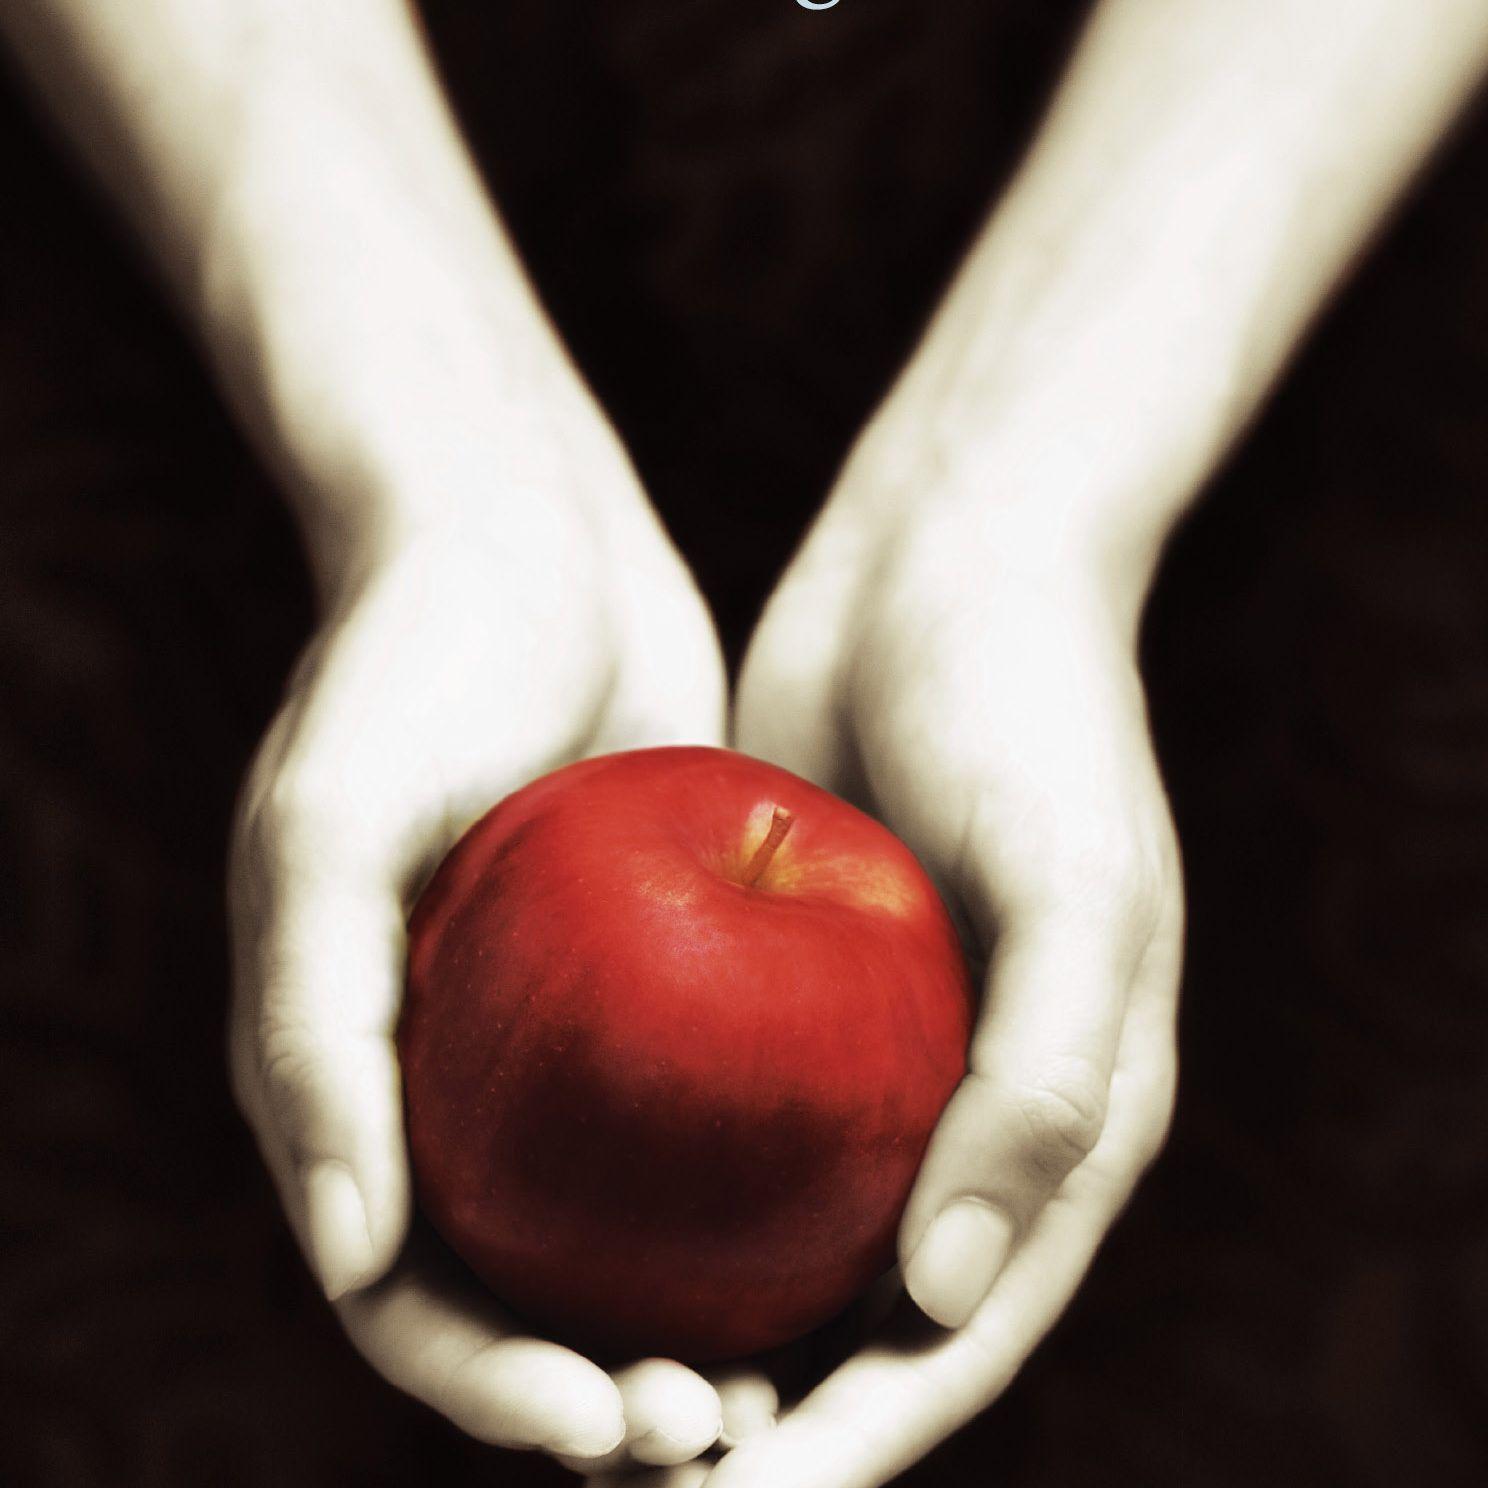 Twilight' by Stephenie Meyer - Book Review